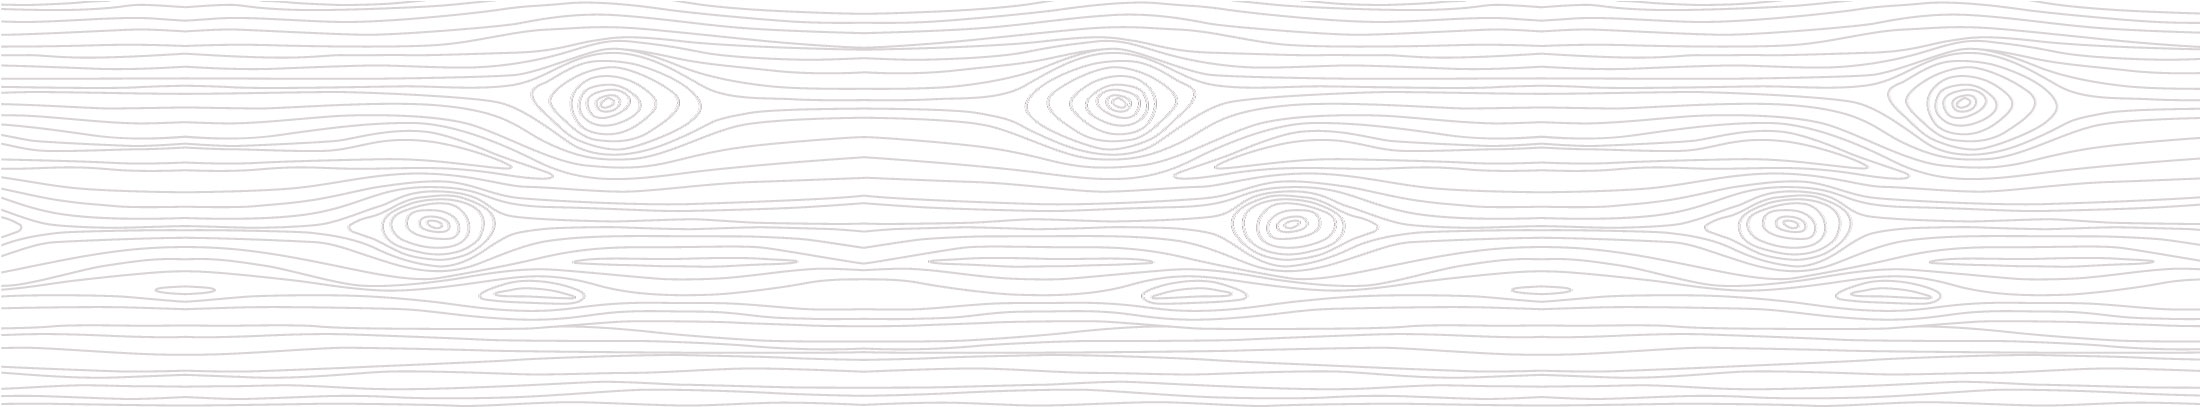 wood-grain-wall-decal-sputnik-design-partners-toronto-lcbo-vqa-pop-up.jpg